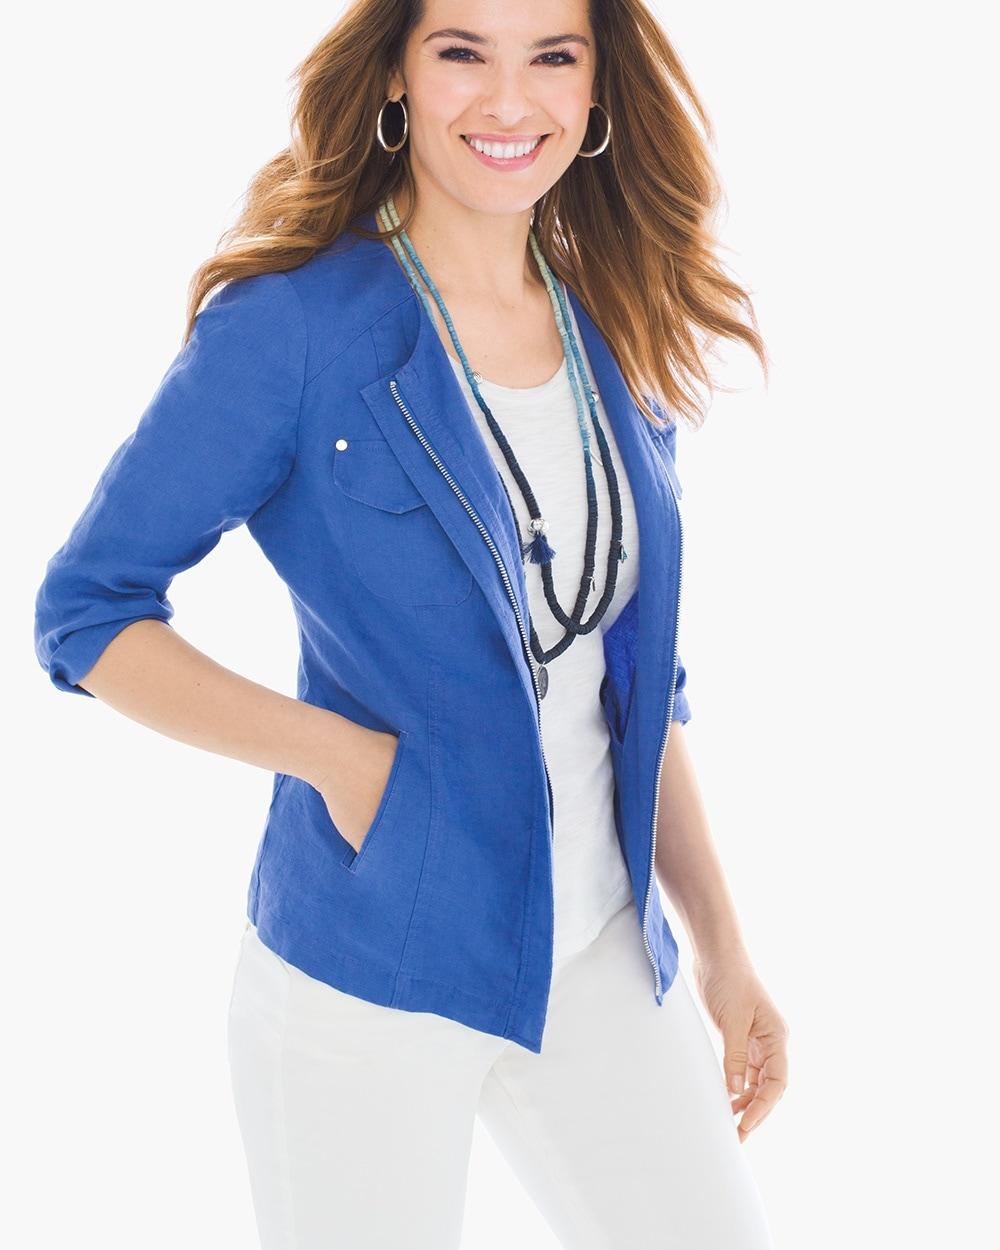 Clean Linen Jacket